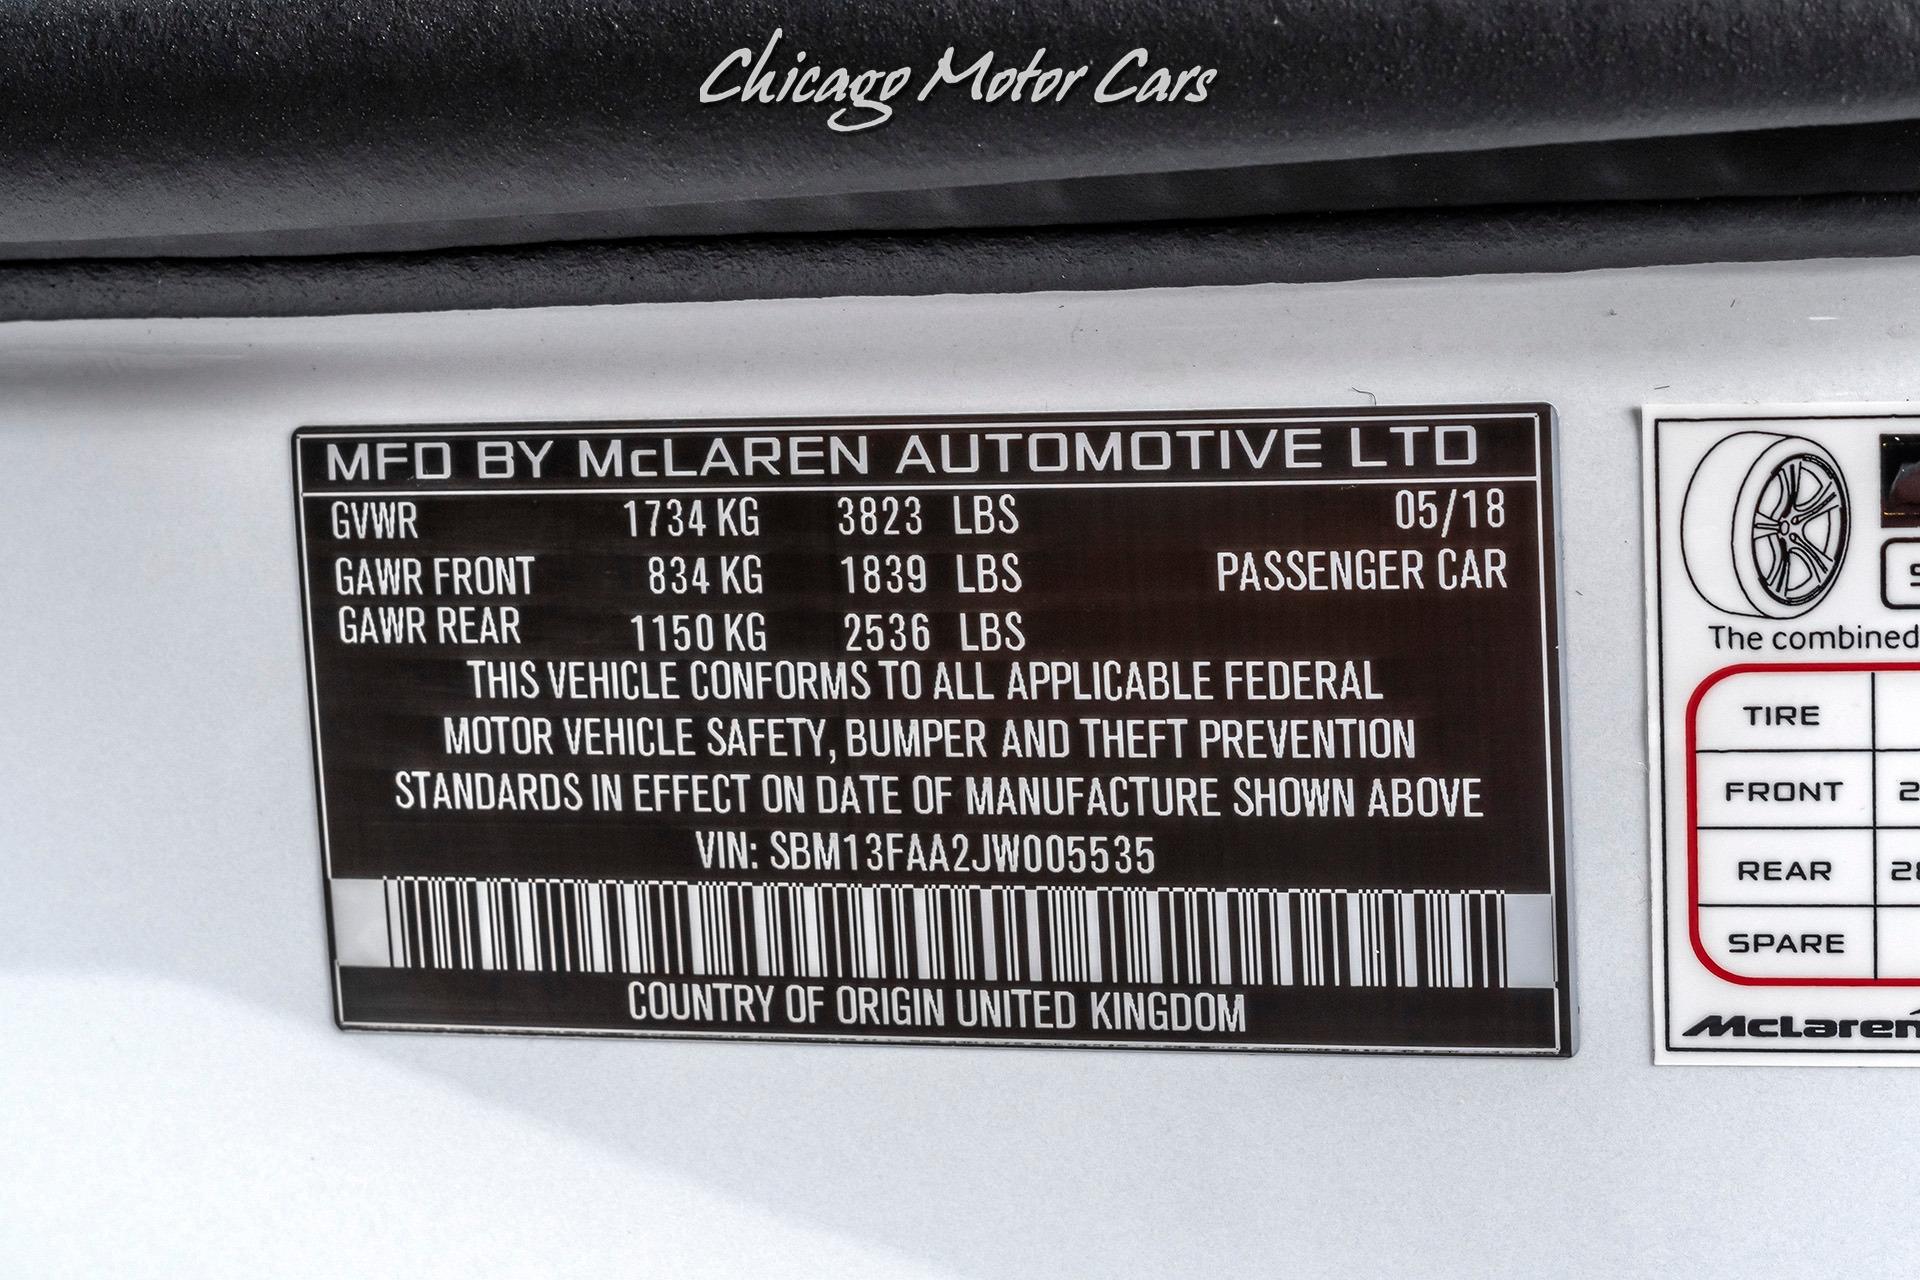 Used-2018-McLaren-570S-Spider-MSRP-239280-LOADED